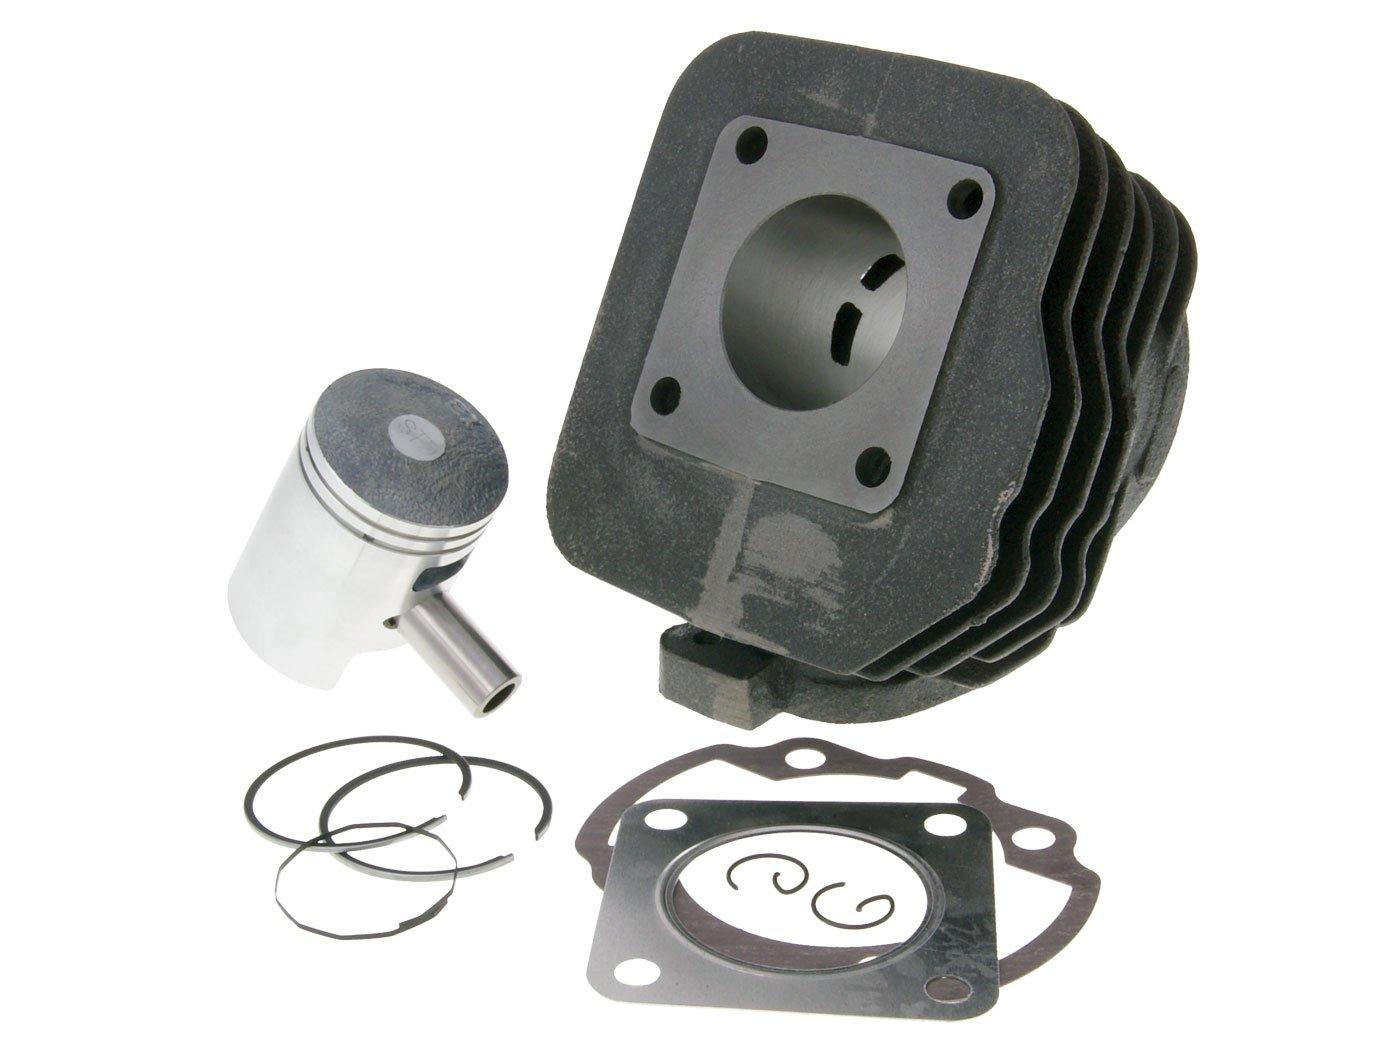 GR 1 SYM pie IP32549-50cc Cylinderkit para Kymco Cilindro